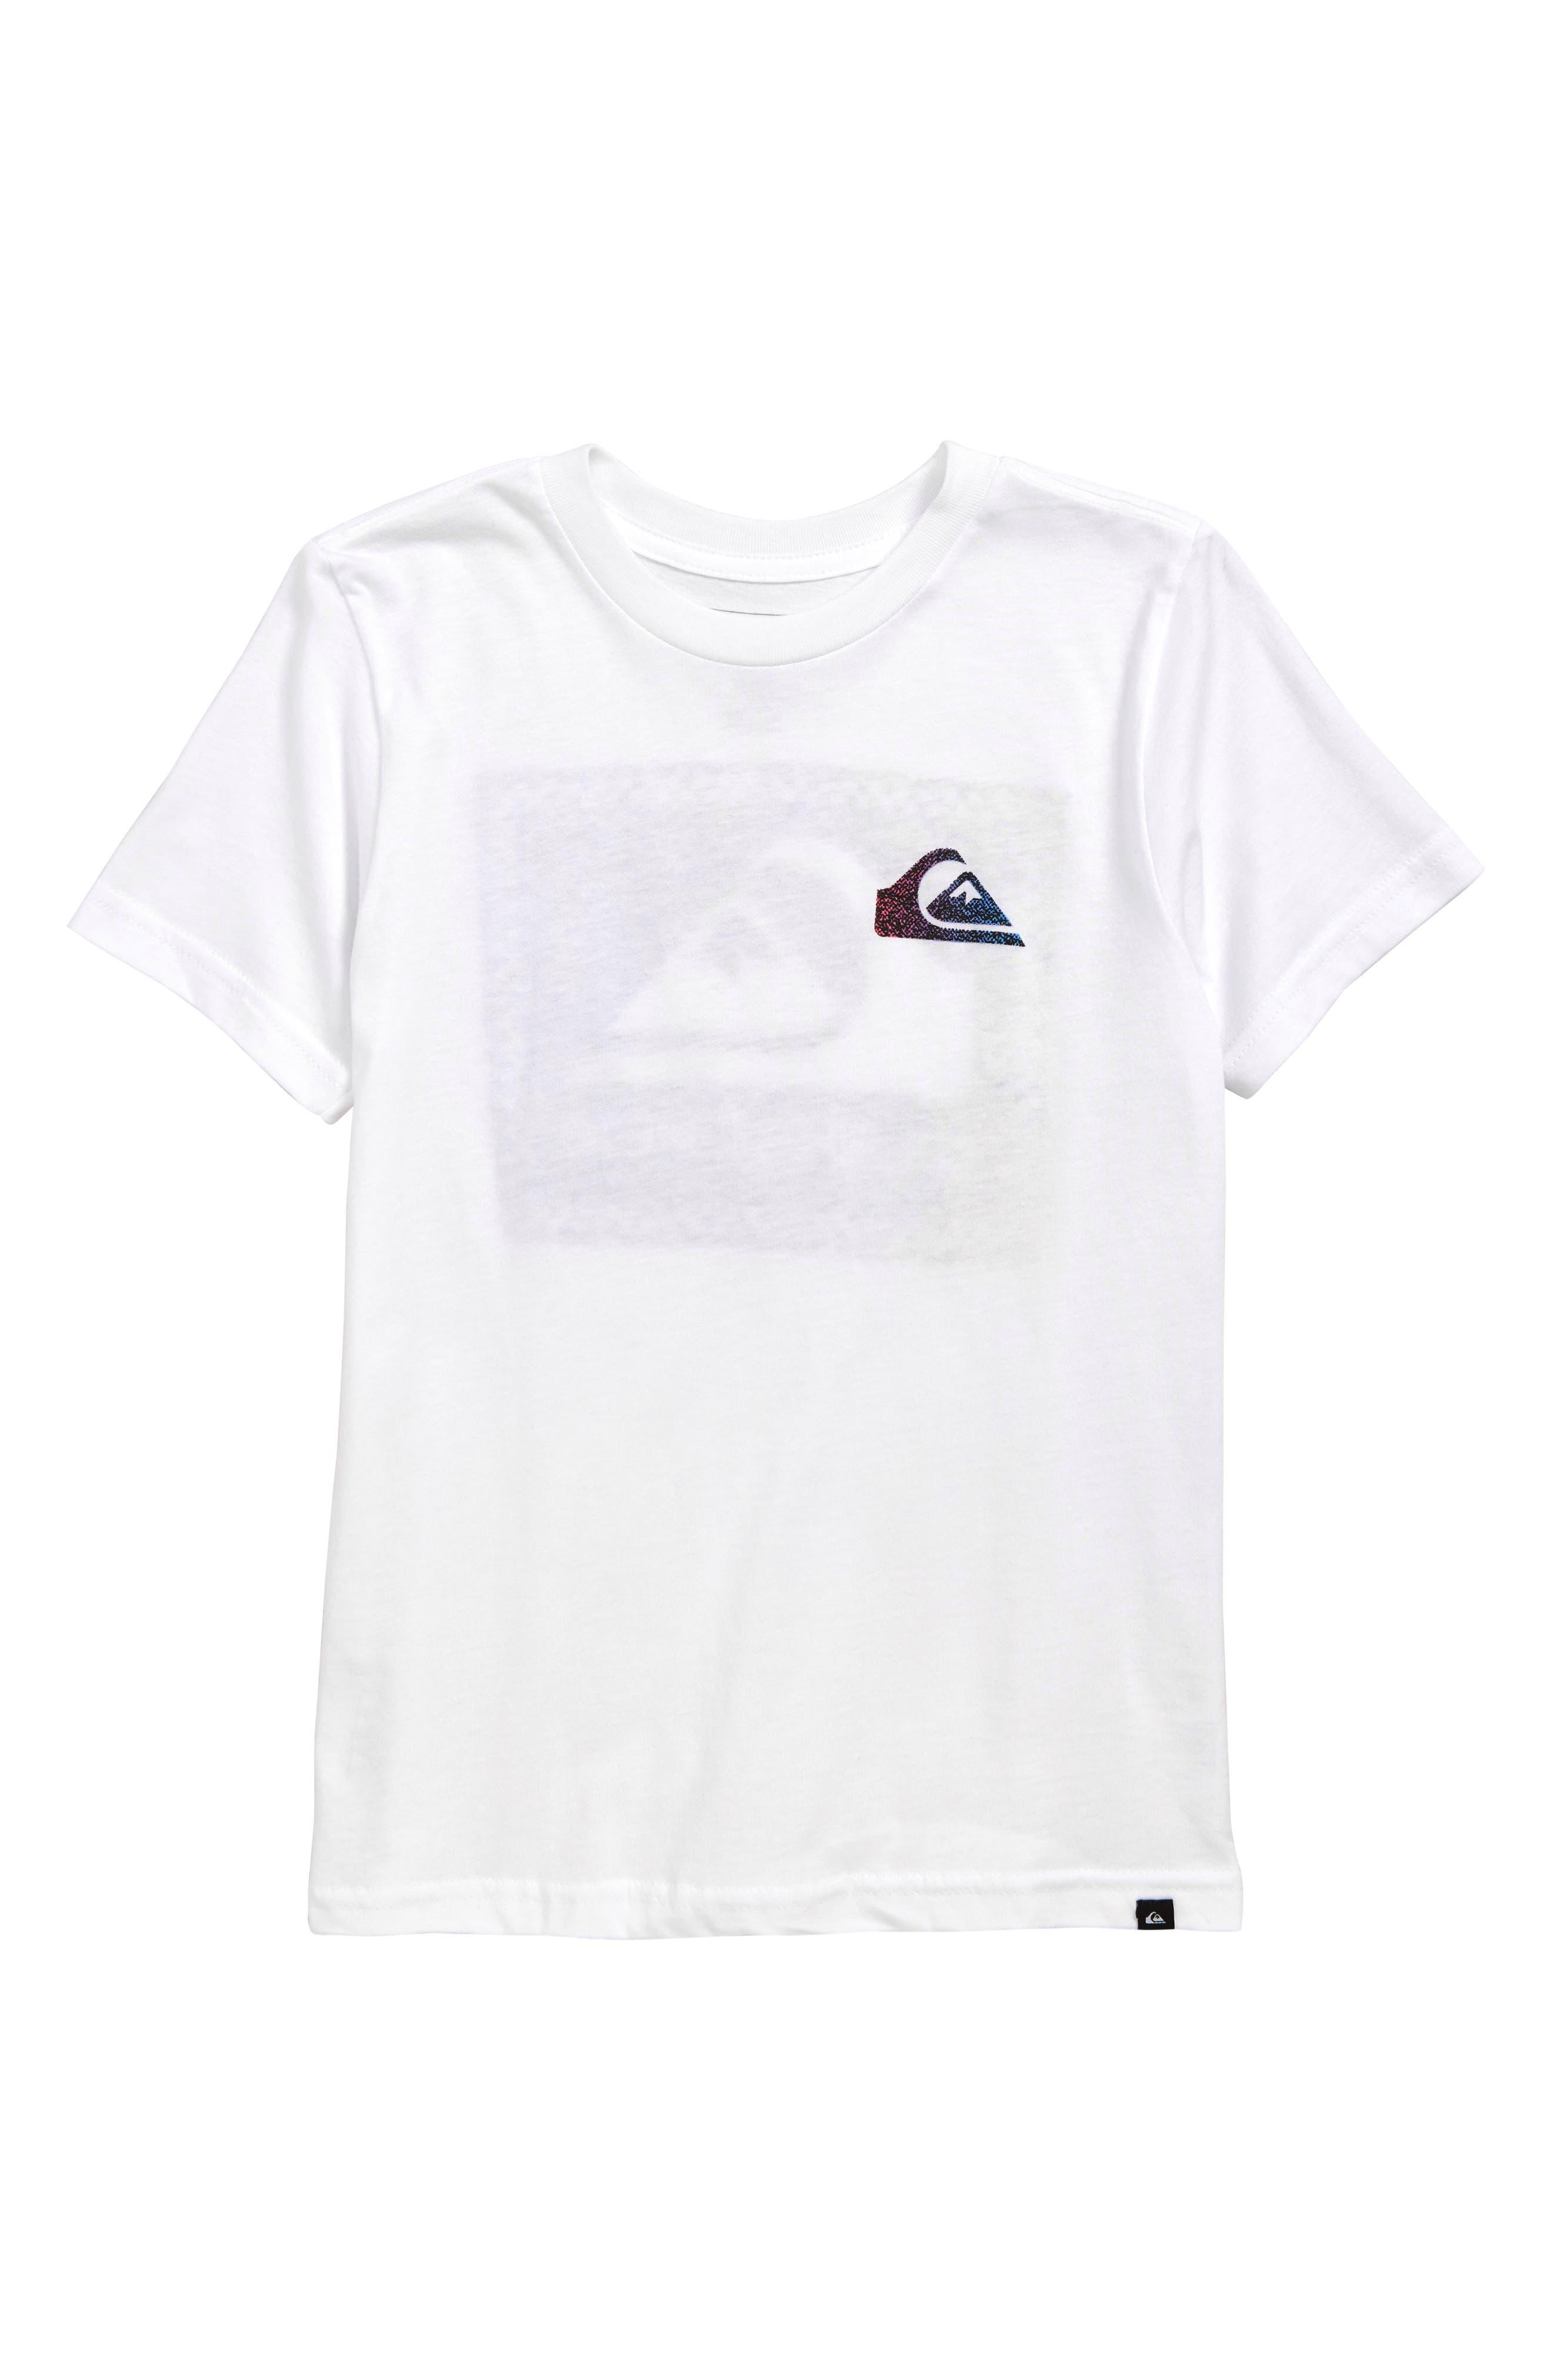 QUIKSILVER, Time Warp T-Shirt, Main thumbnail 1, color, WHITE